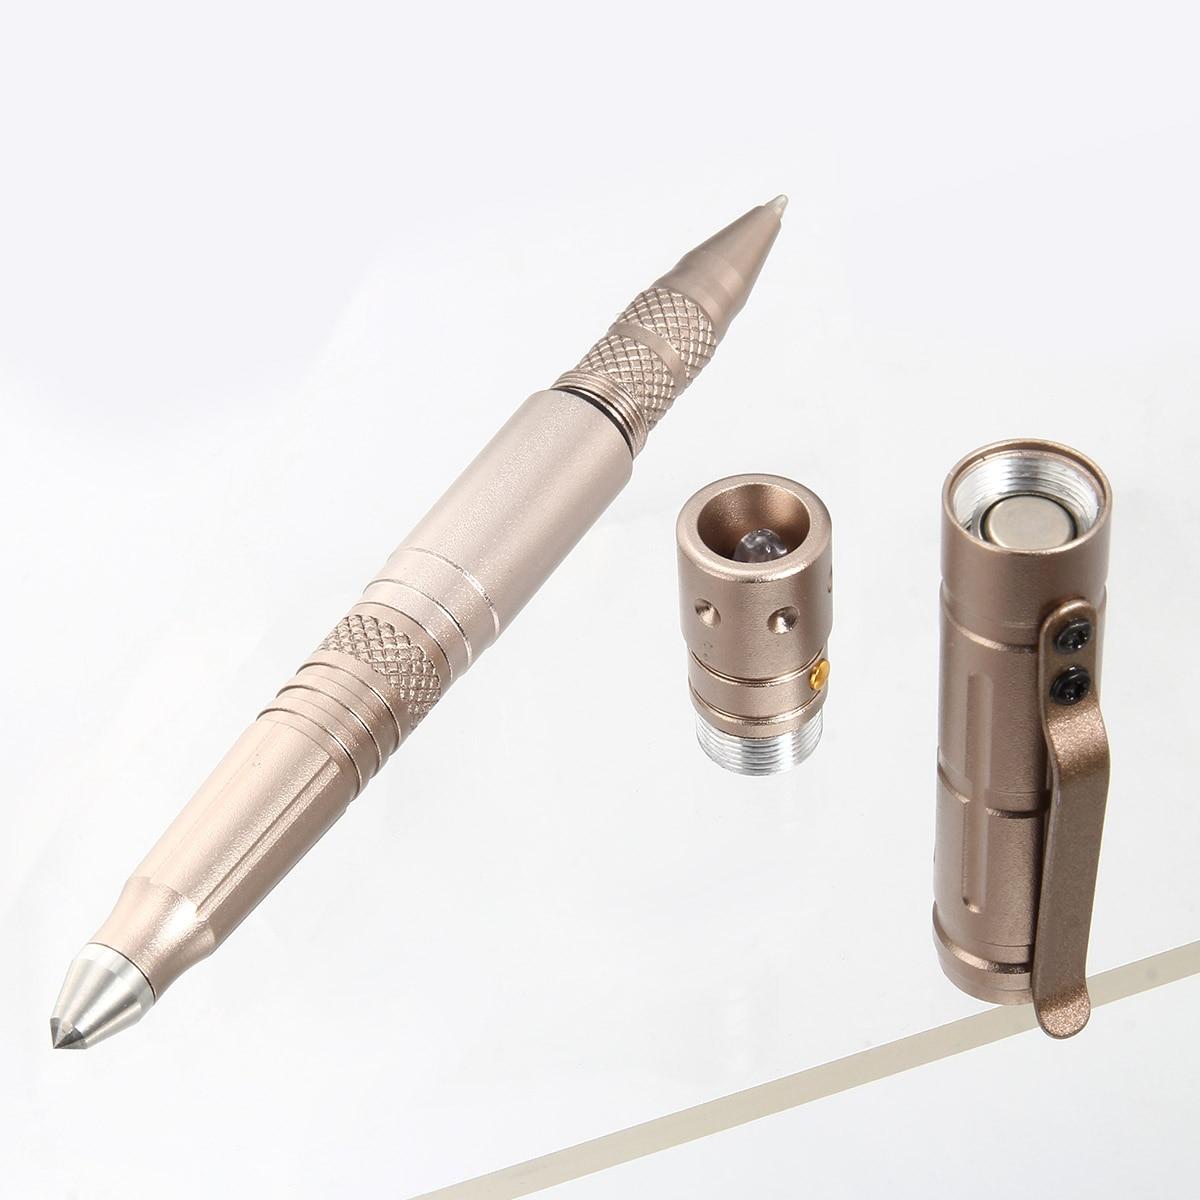 Купить с кэшбэком Multi-function Tactical Pen Survival Military LED Flashlight Glass Breaker Self Defense Tool Ballpoint Pens SGA998